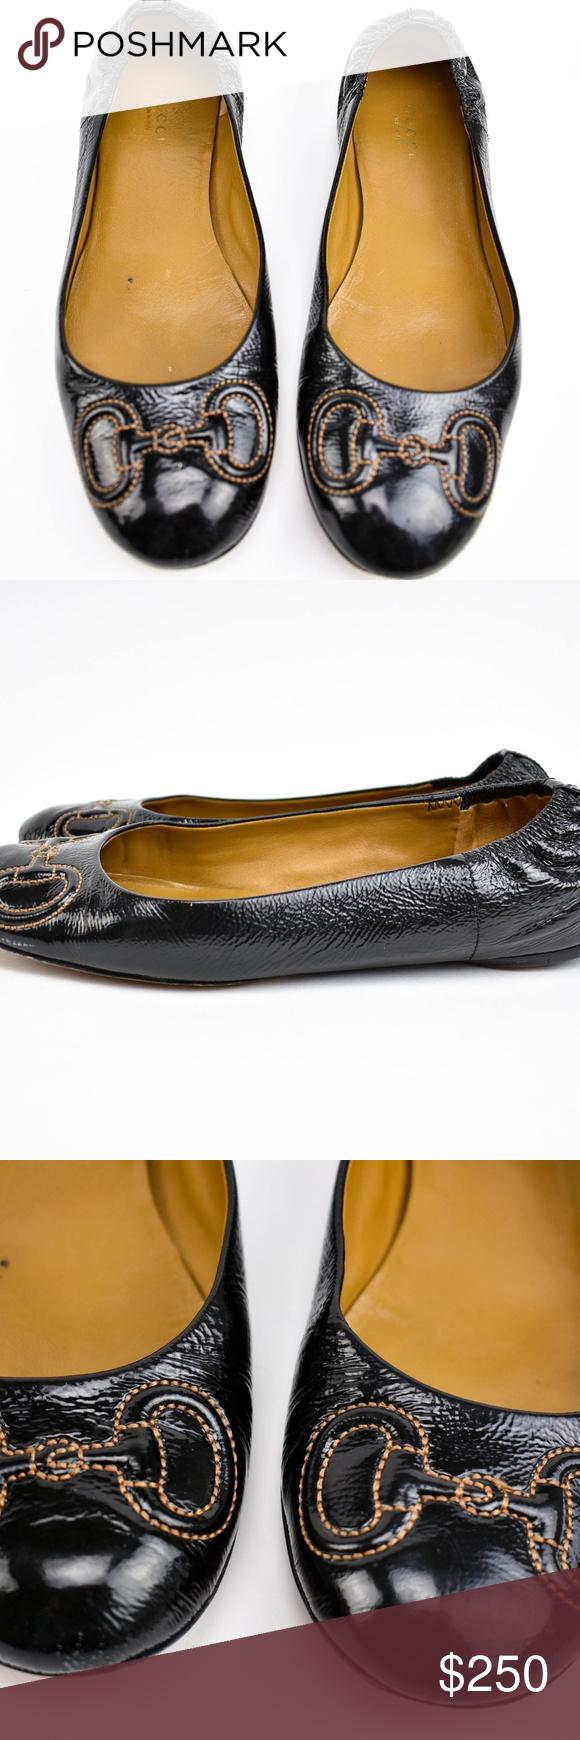 63151c19e GUCCI Black Leather & Horsebit Ballet Flats Sz 7.5 Condition: pre-owned  (